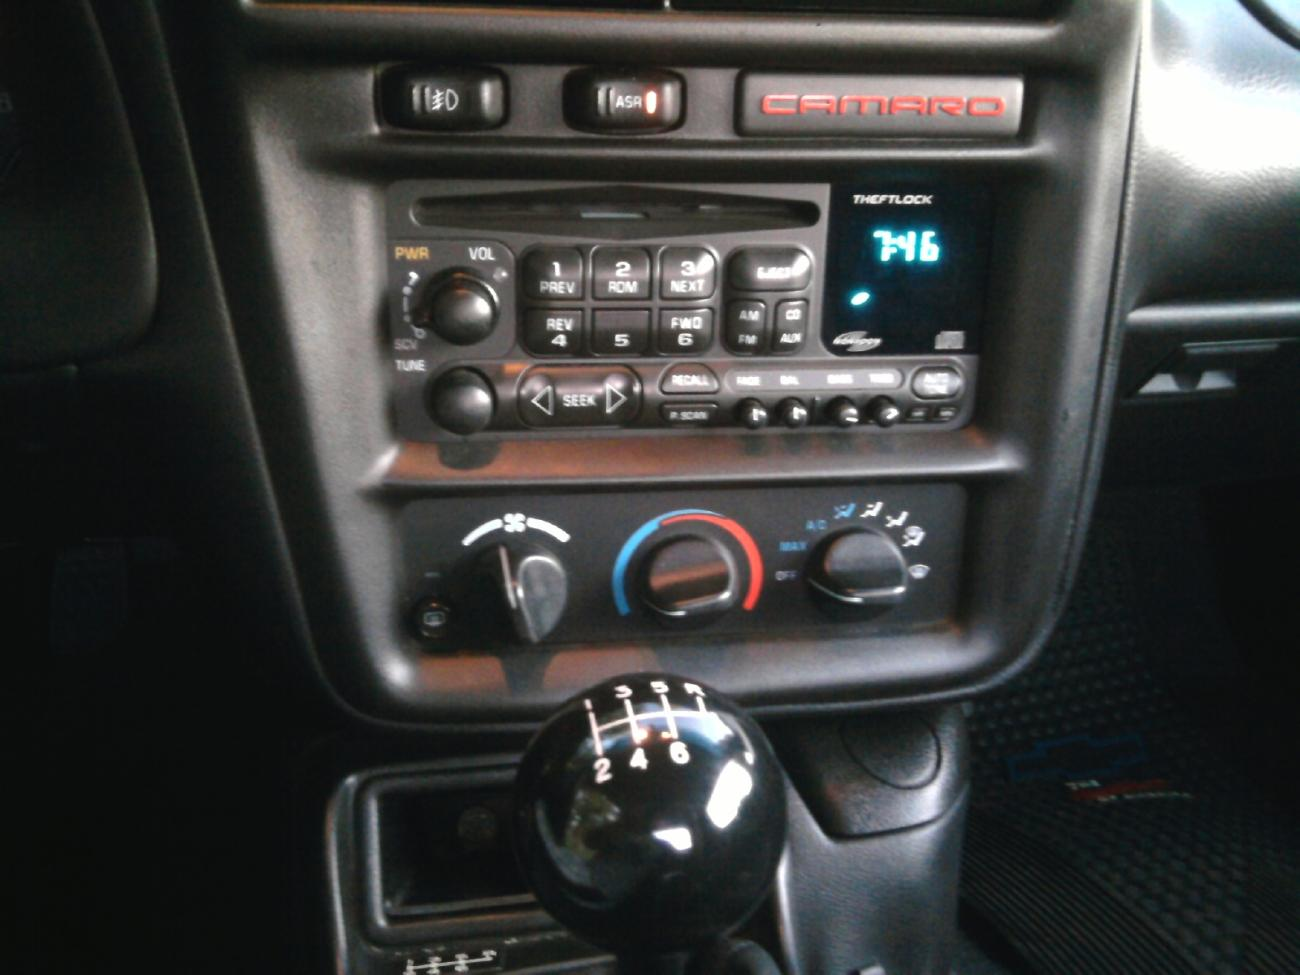 2000 Camaro Ss 4 Sale 26k Camaro5 Chevy Camaro Forum